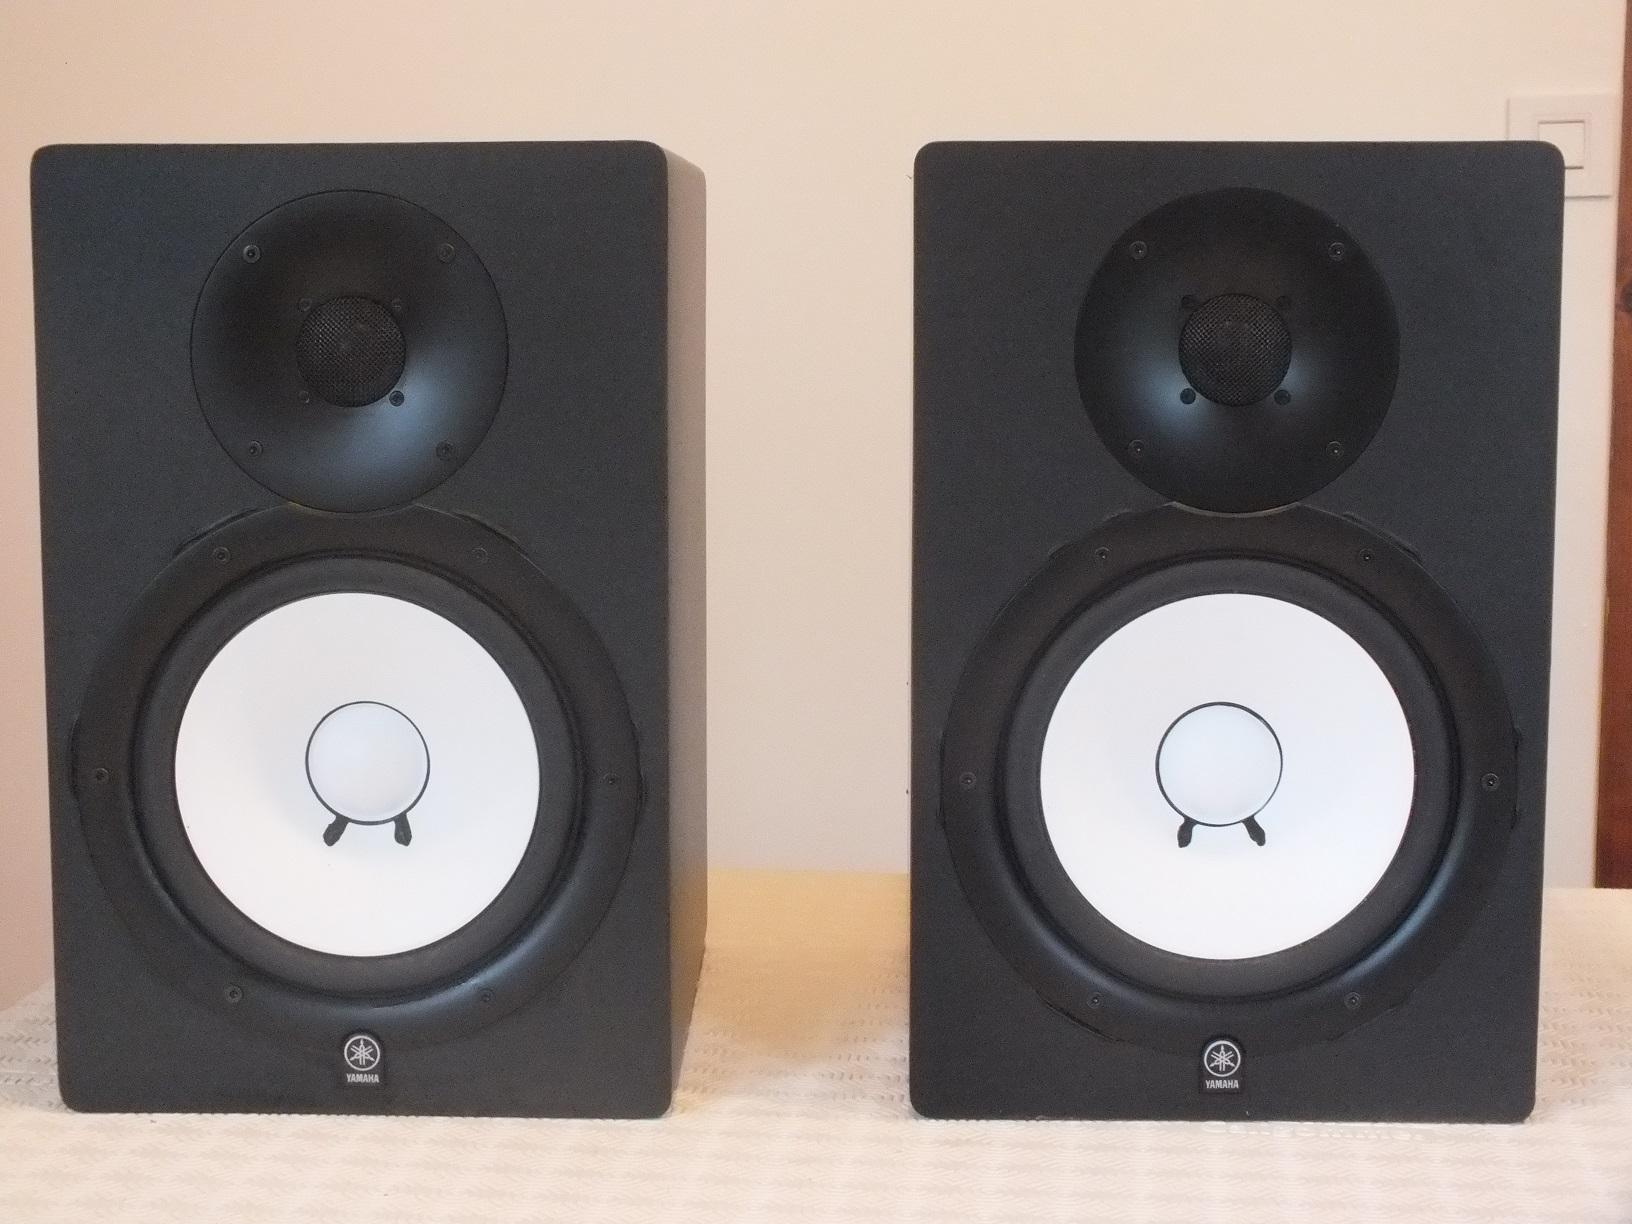 yamaha hs80m image 1003271 audiofanzine. Black Bedroom Furniture Sets. Home Design Ideas